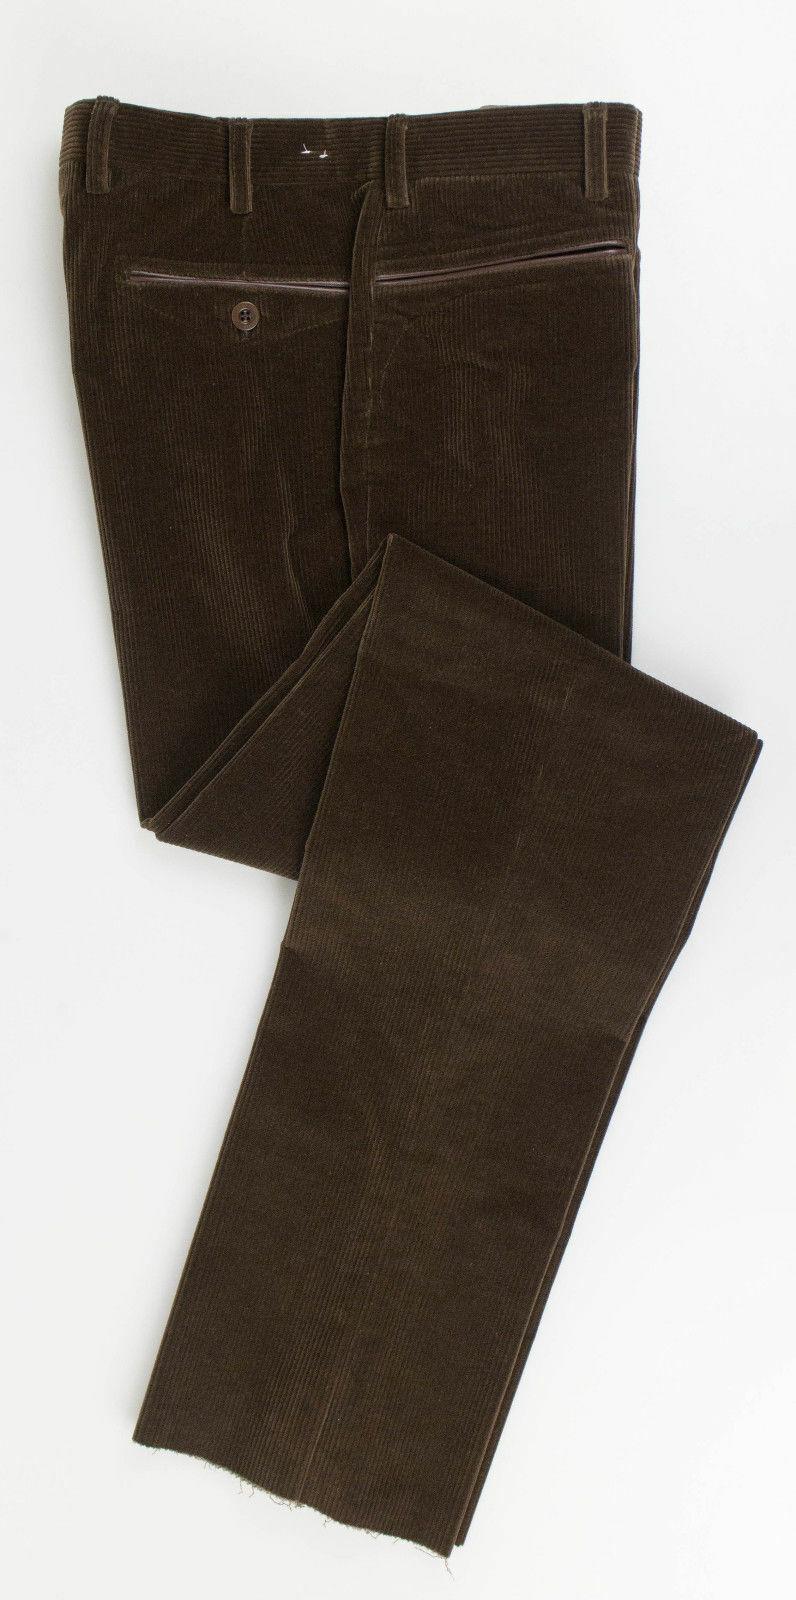 New. BRIONI Amiata Brown Cotton Blend W  Leather Corduroy Pants Size 46 30